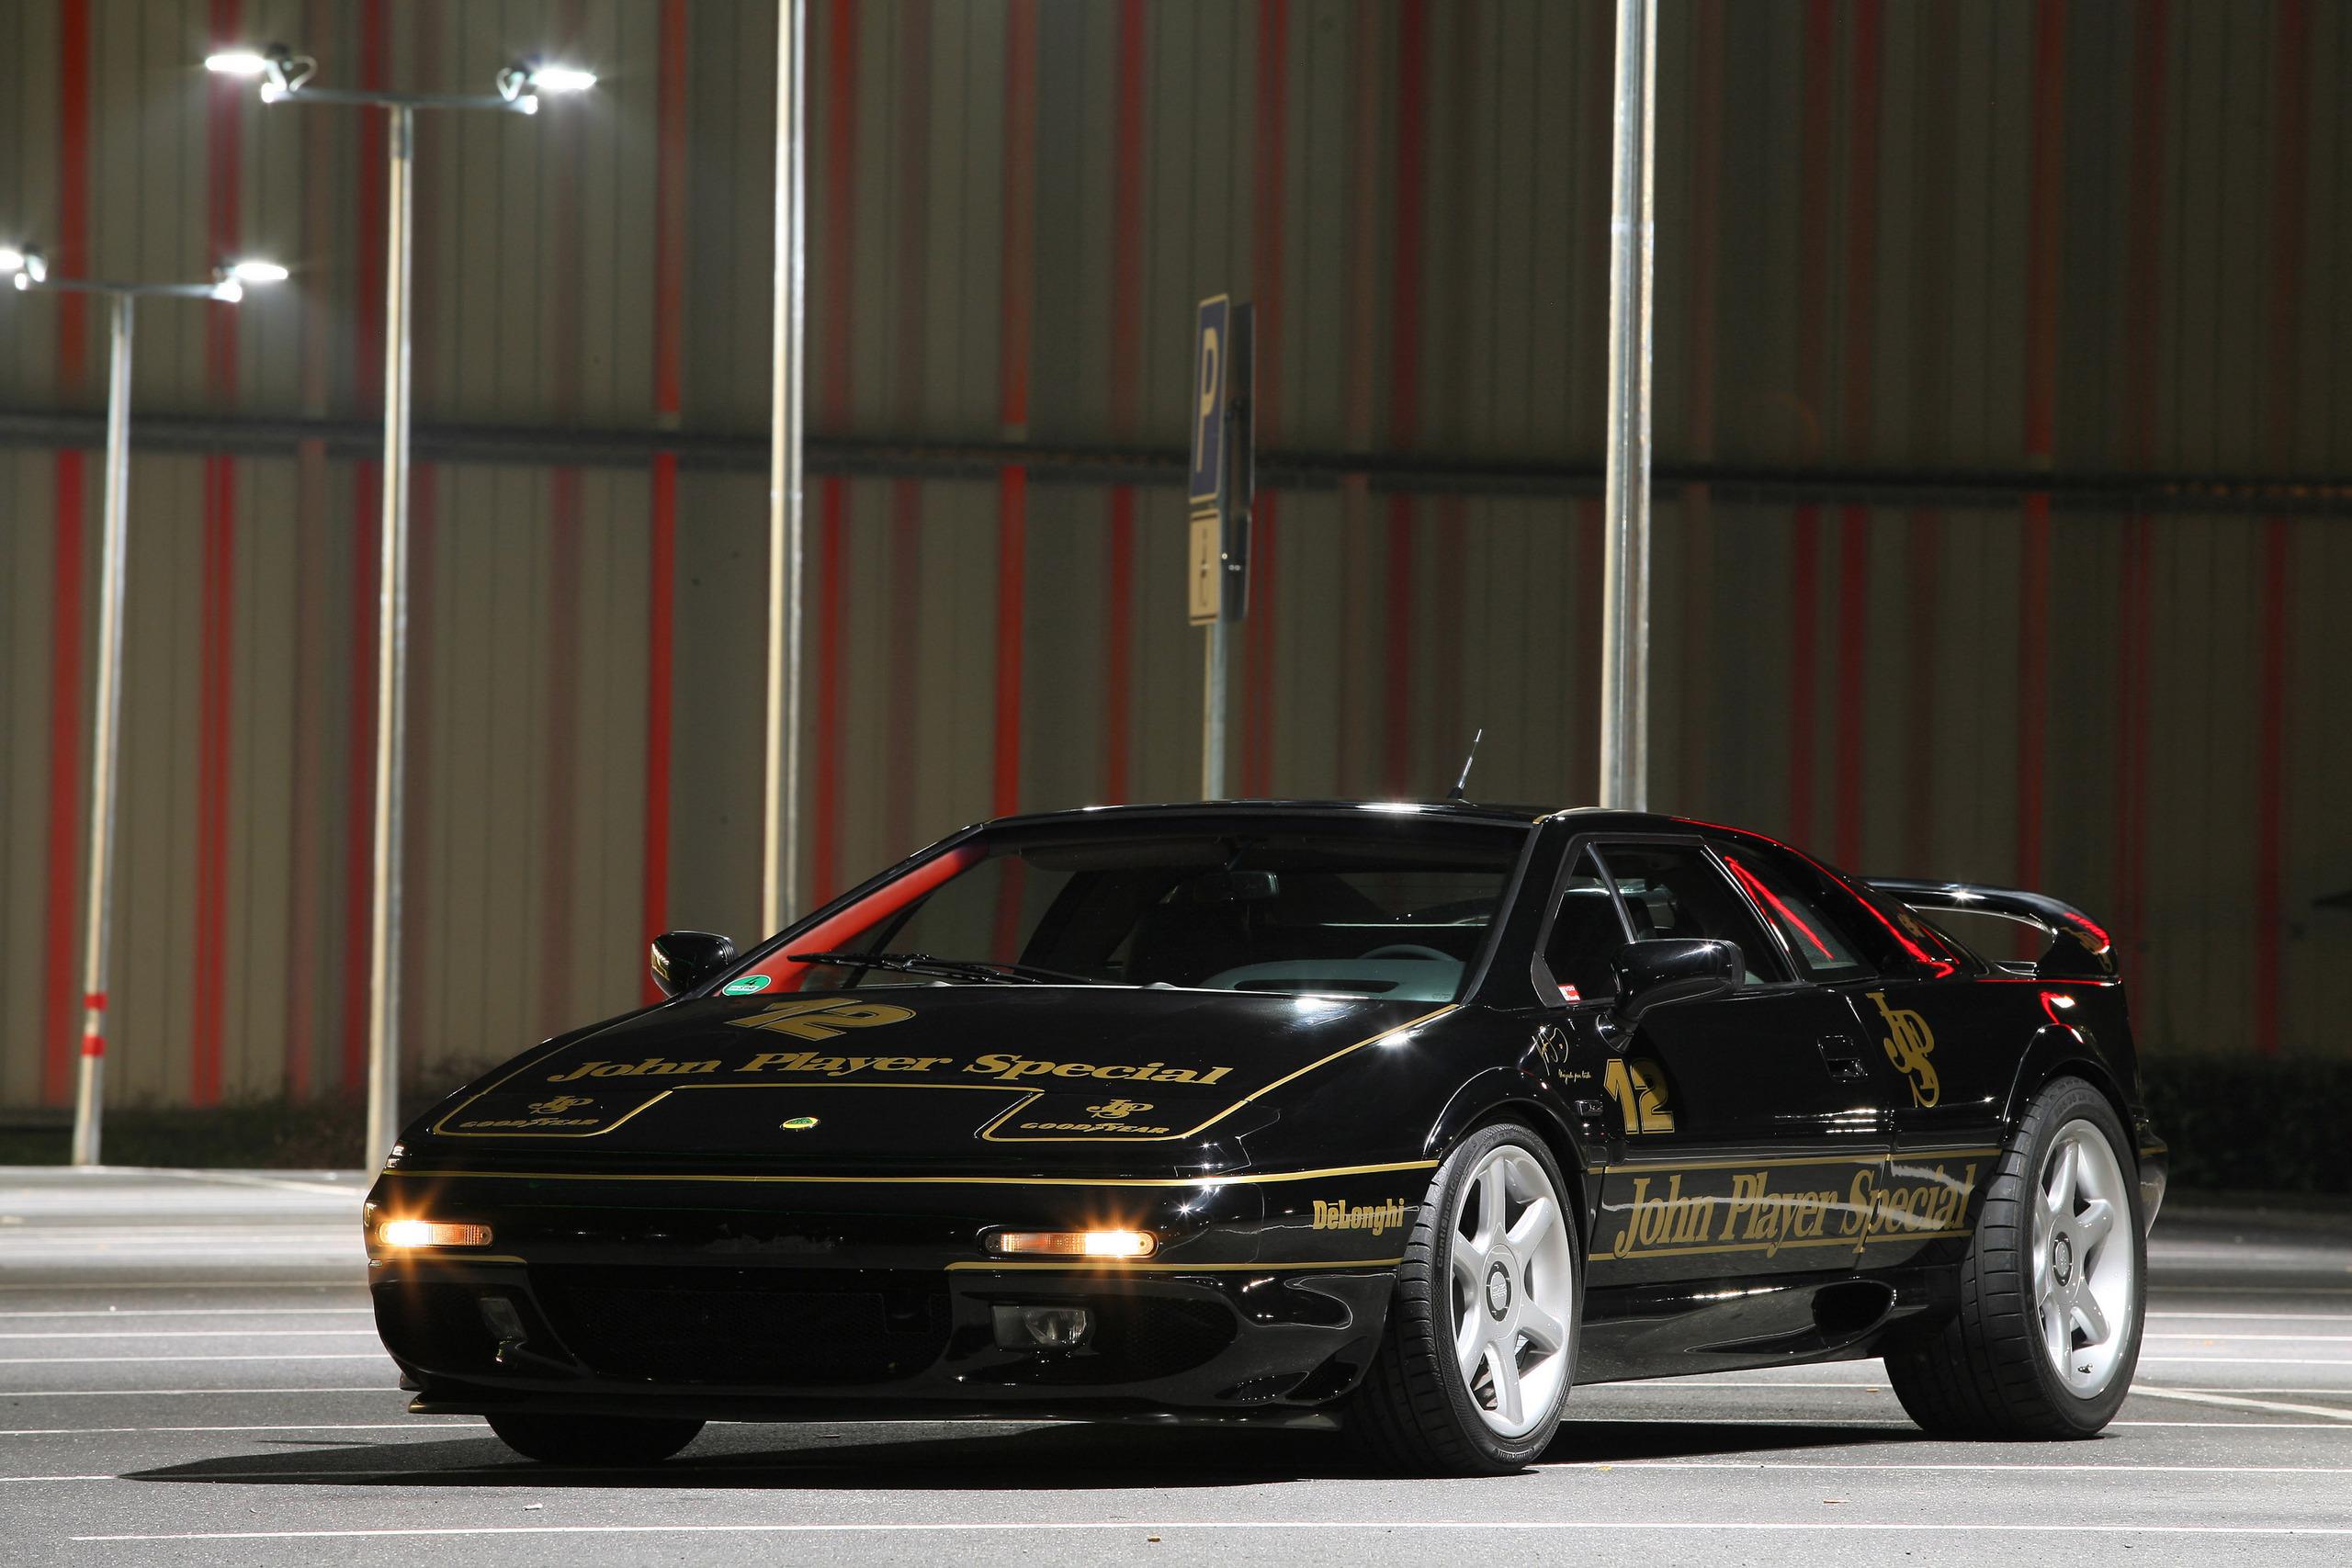 Dodge Dart Turbo >> LOTUS ESPRIT V8 - Sportwagen Foto (30683947) - Fanpop